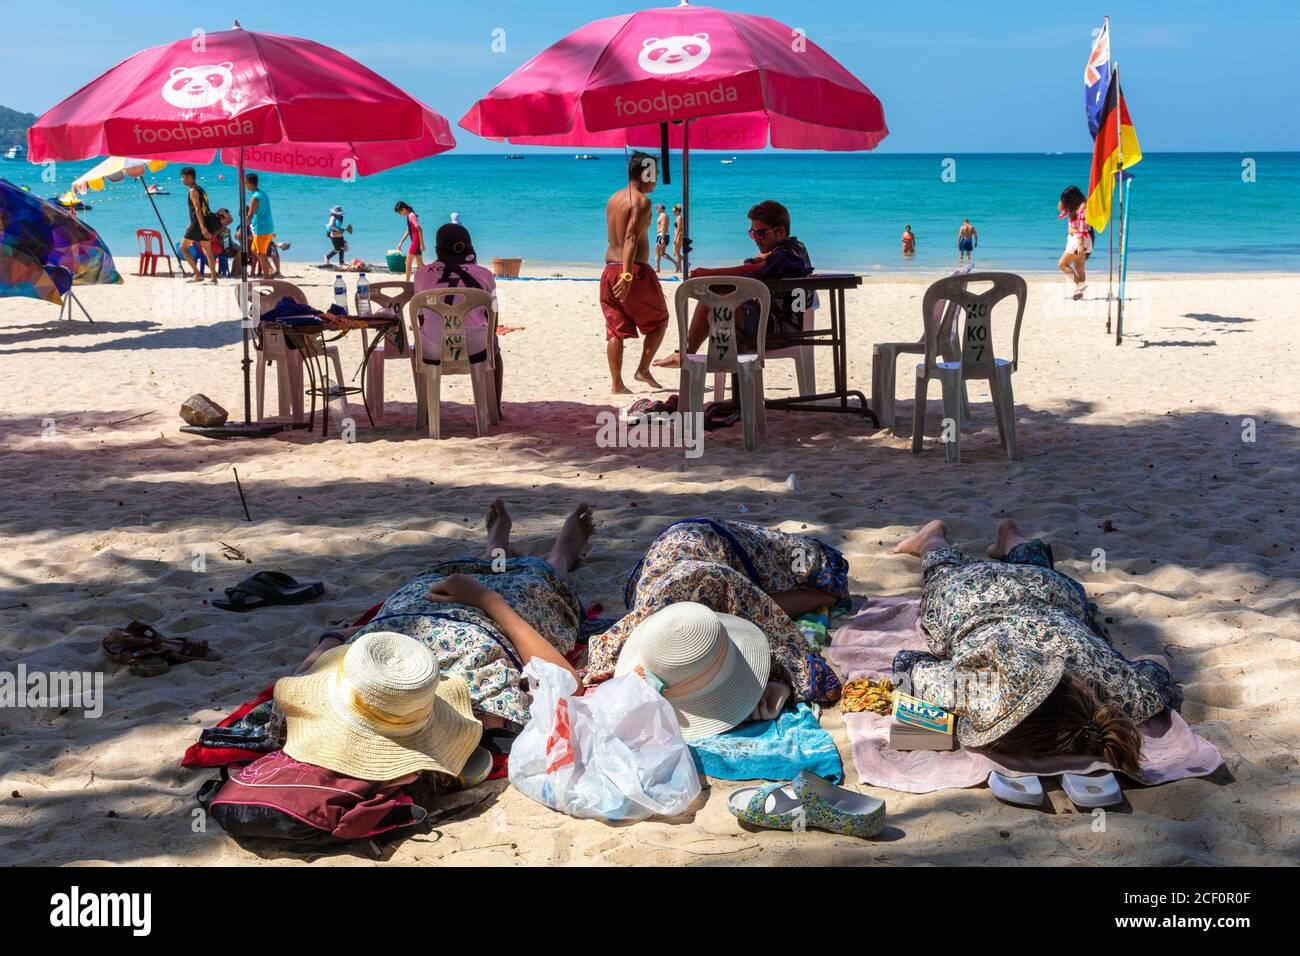 Tourists sleeping on the beach, Patong, Phuket, Thailand Stock Photo